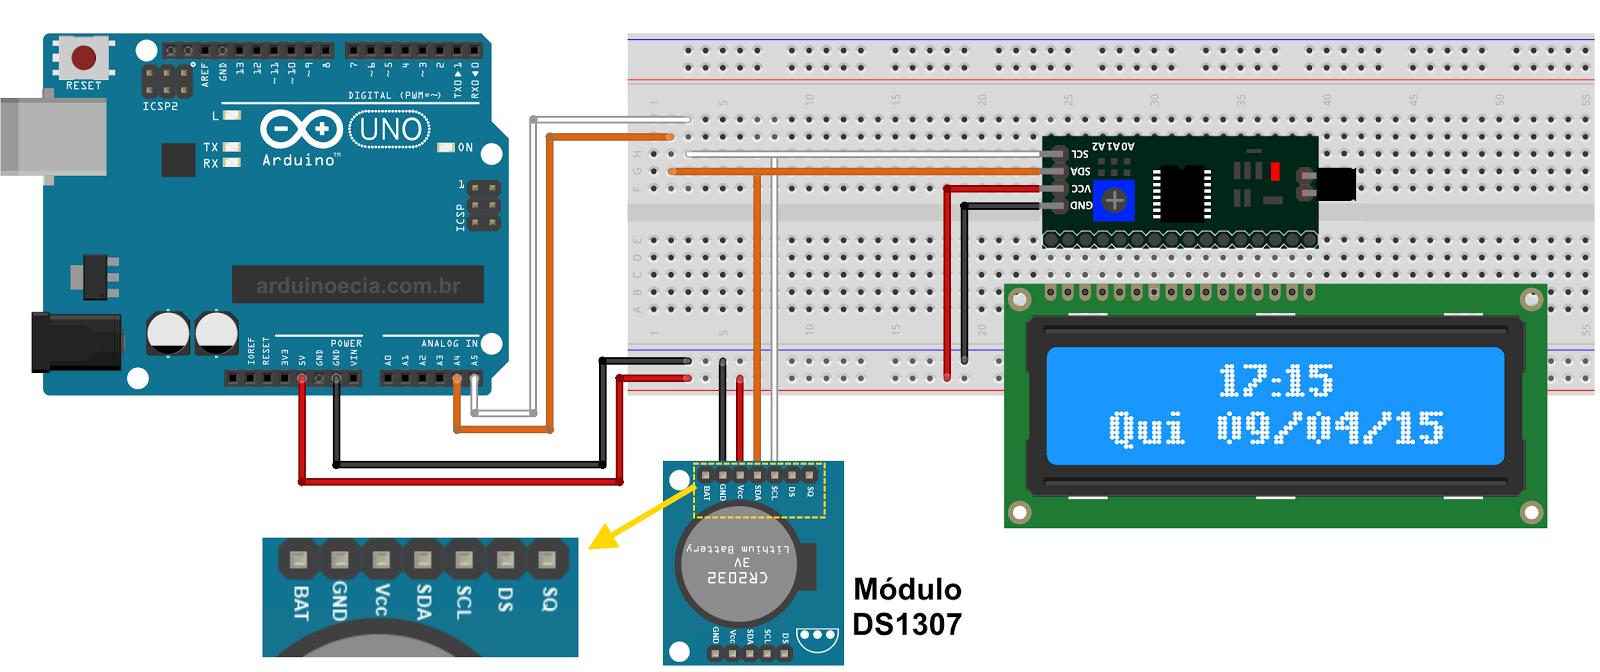 Circuito arduino i2c display lcd 16x2 ds1307